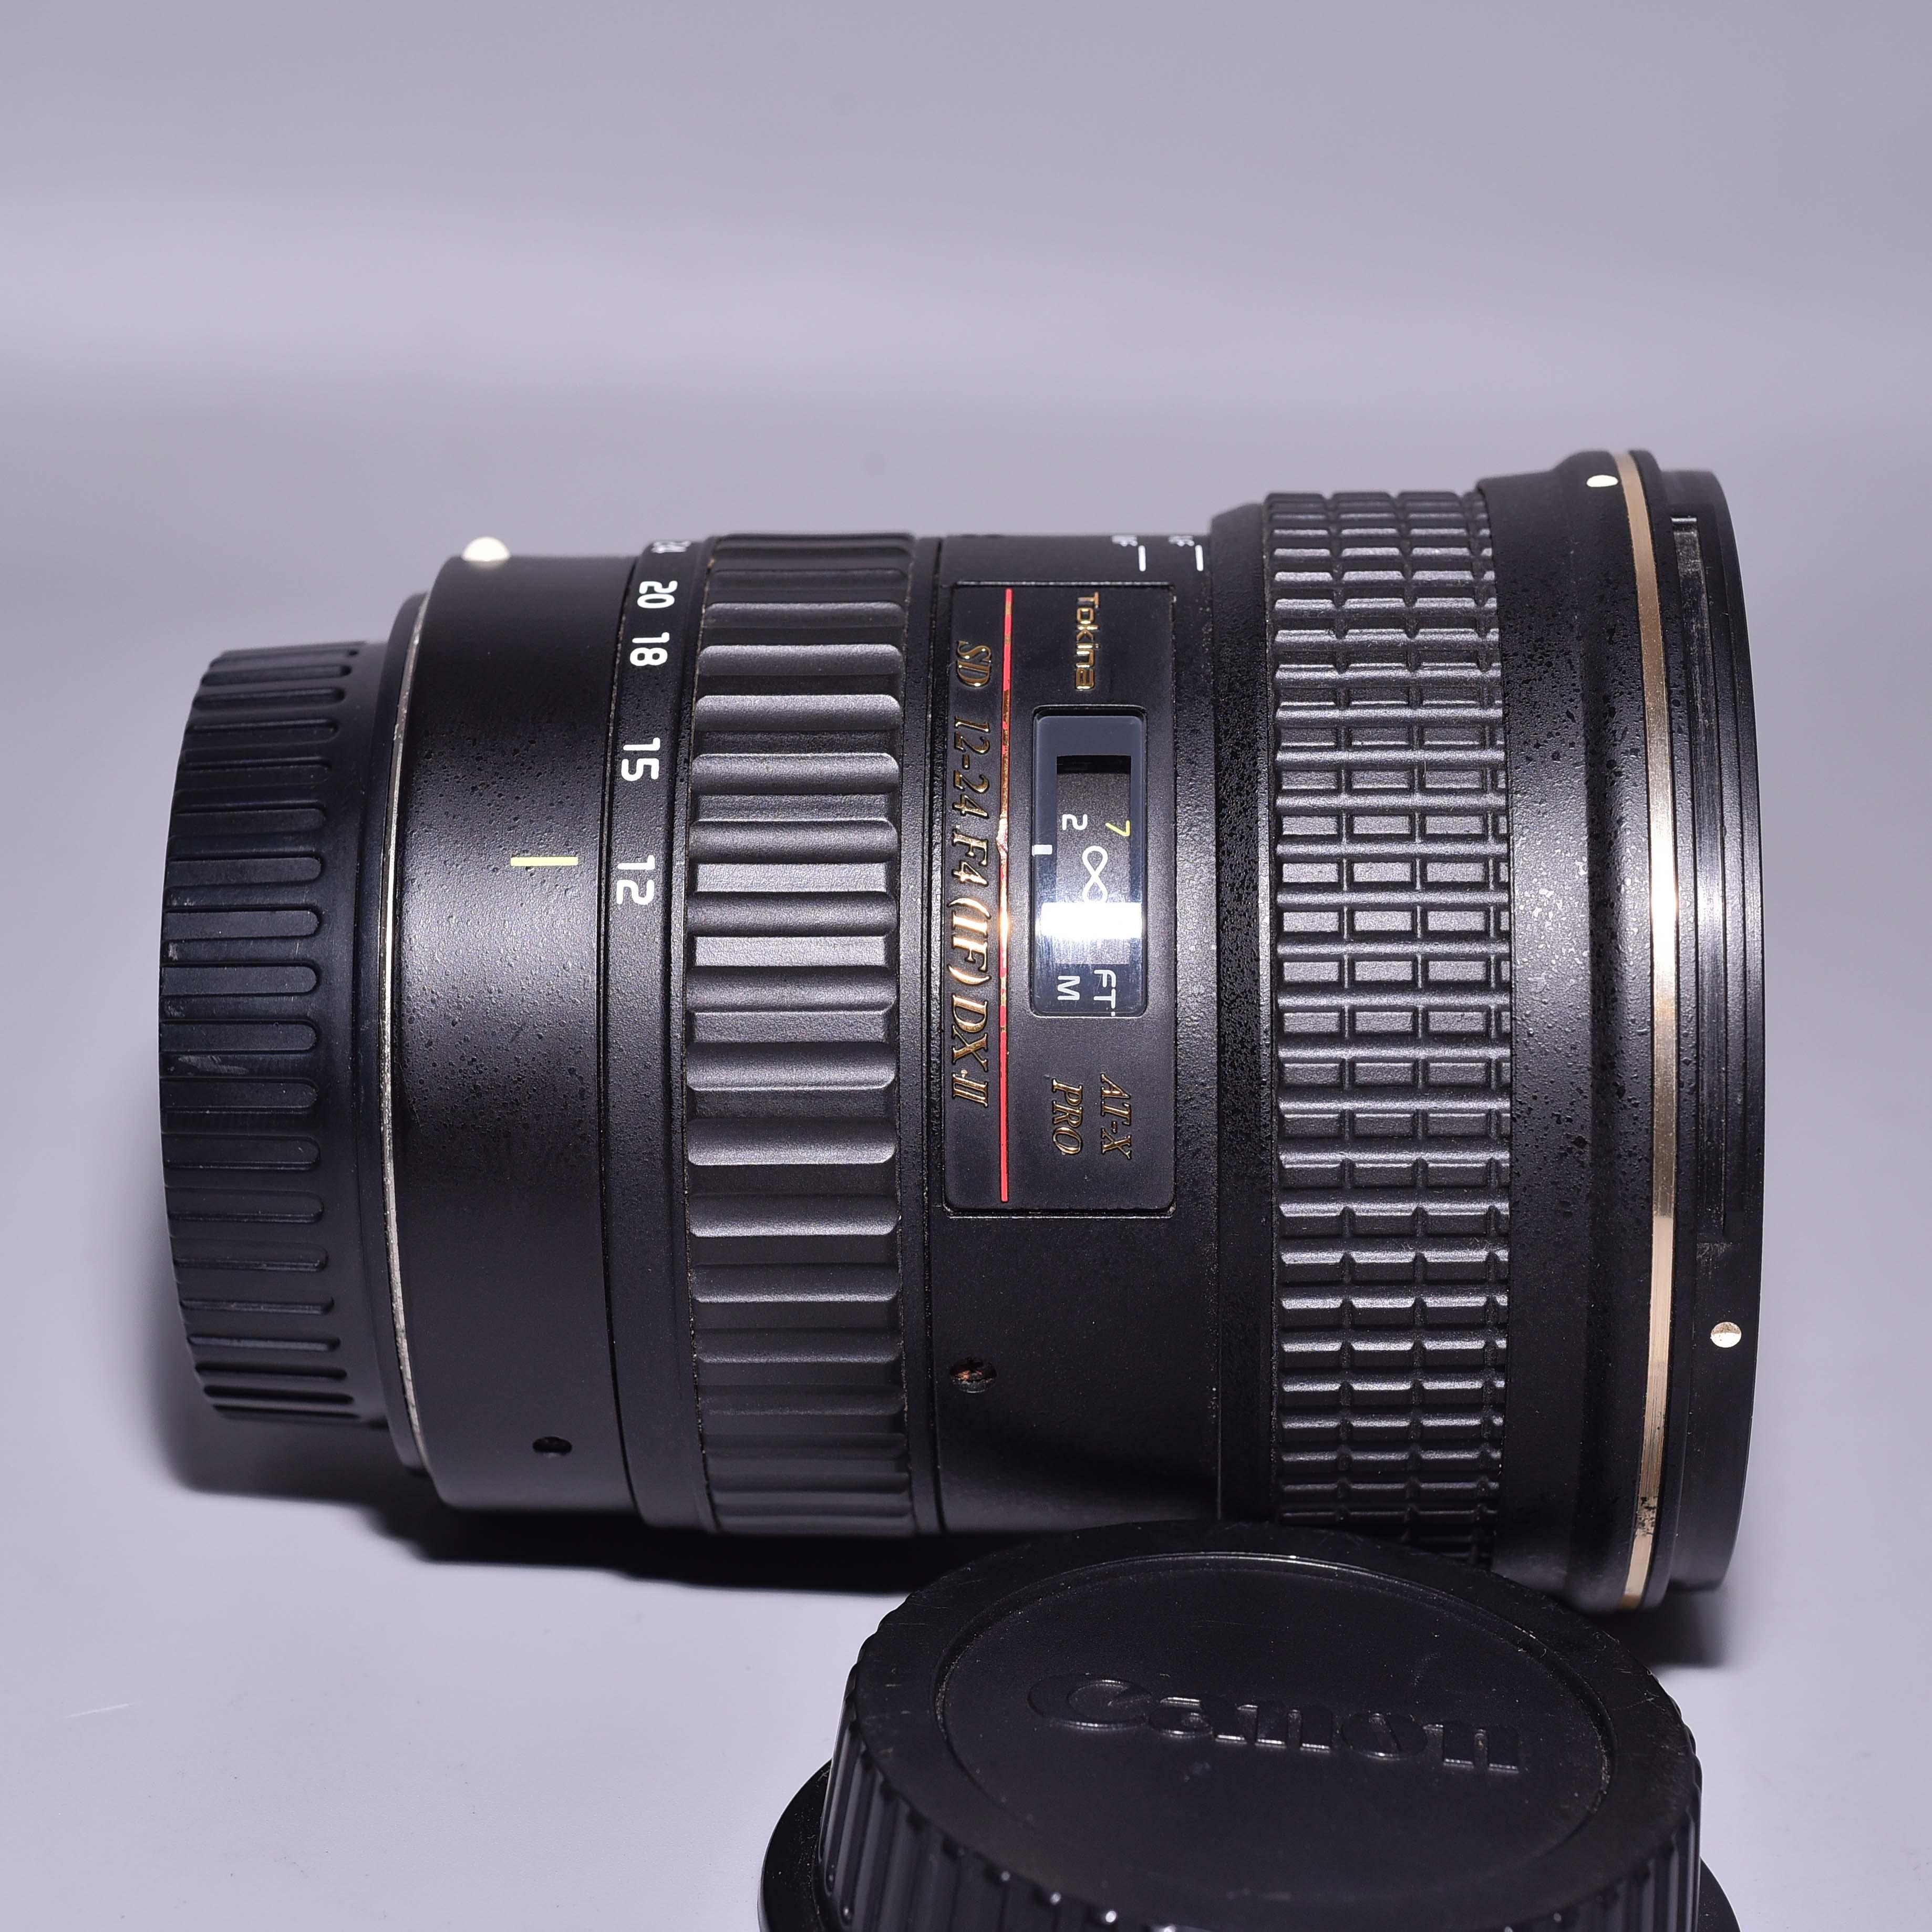 tokina-12-24mm-f4-0-ii-af-canon-tokina-12-24-4-0-13387